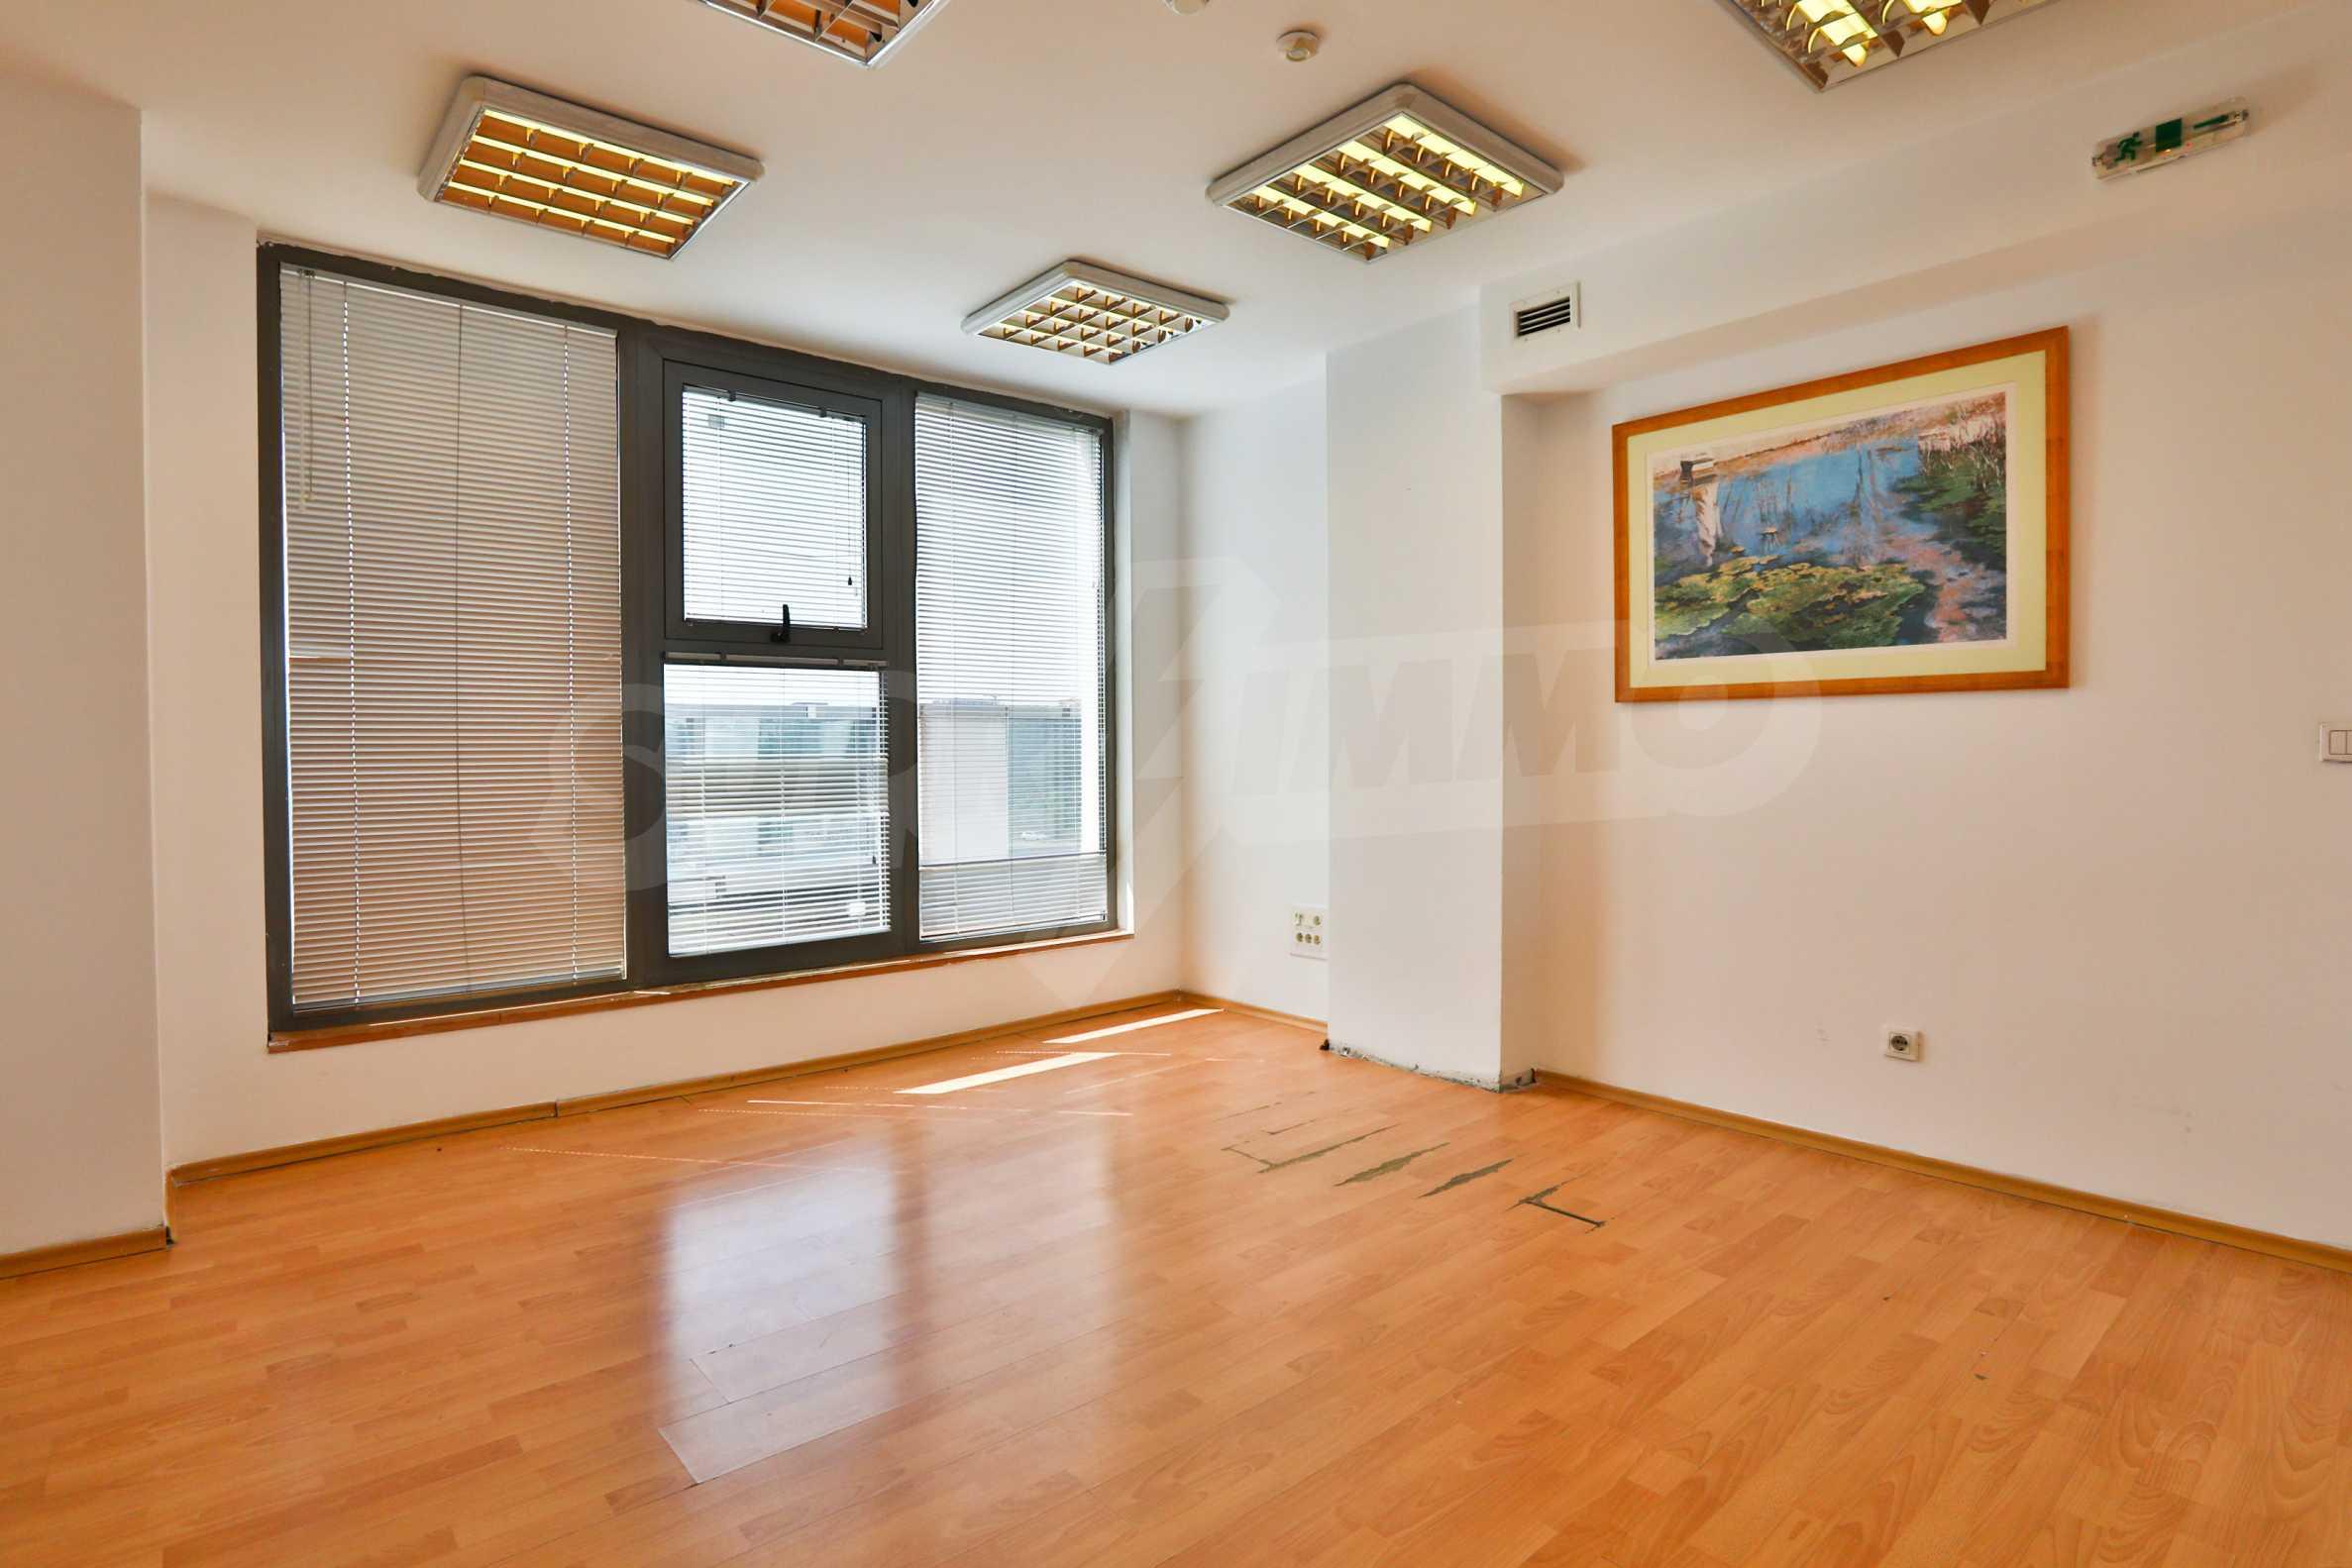 Офис в бизнес сграда висок клас на бул. Цариградско шосе 10